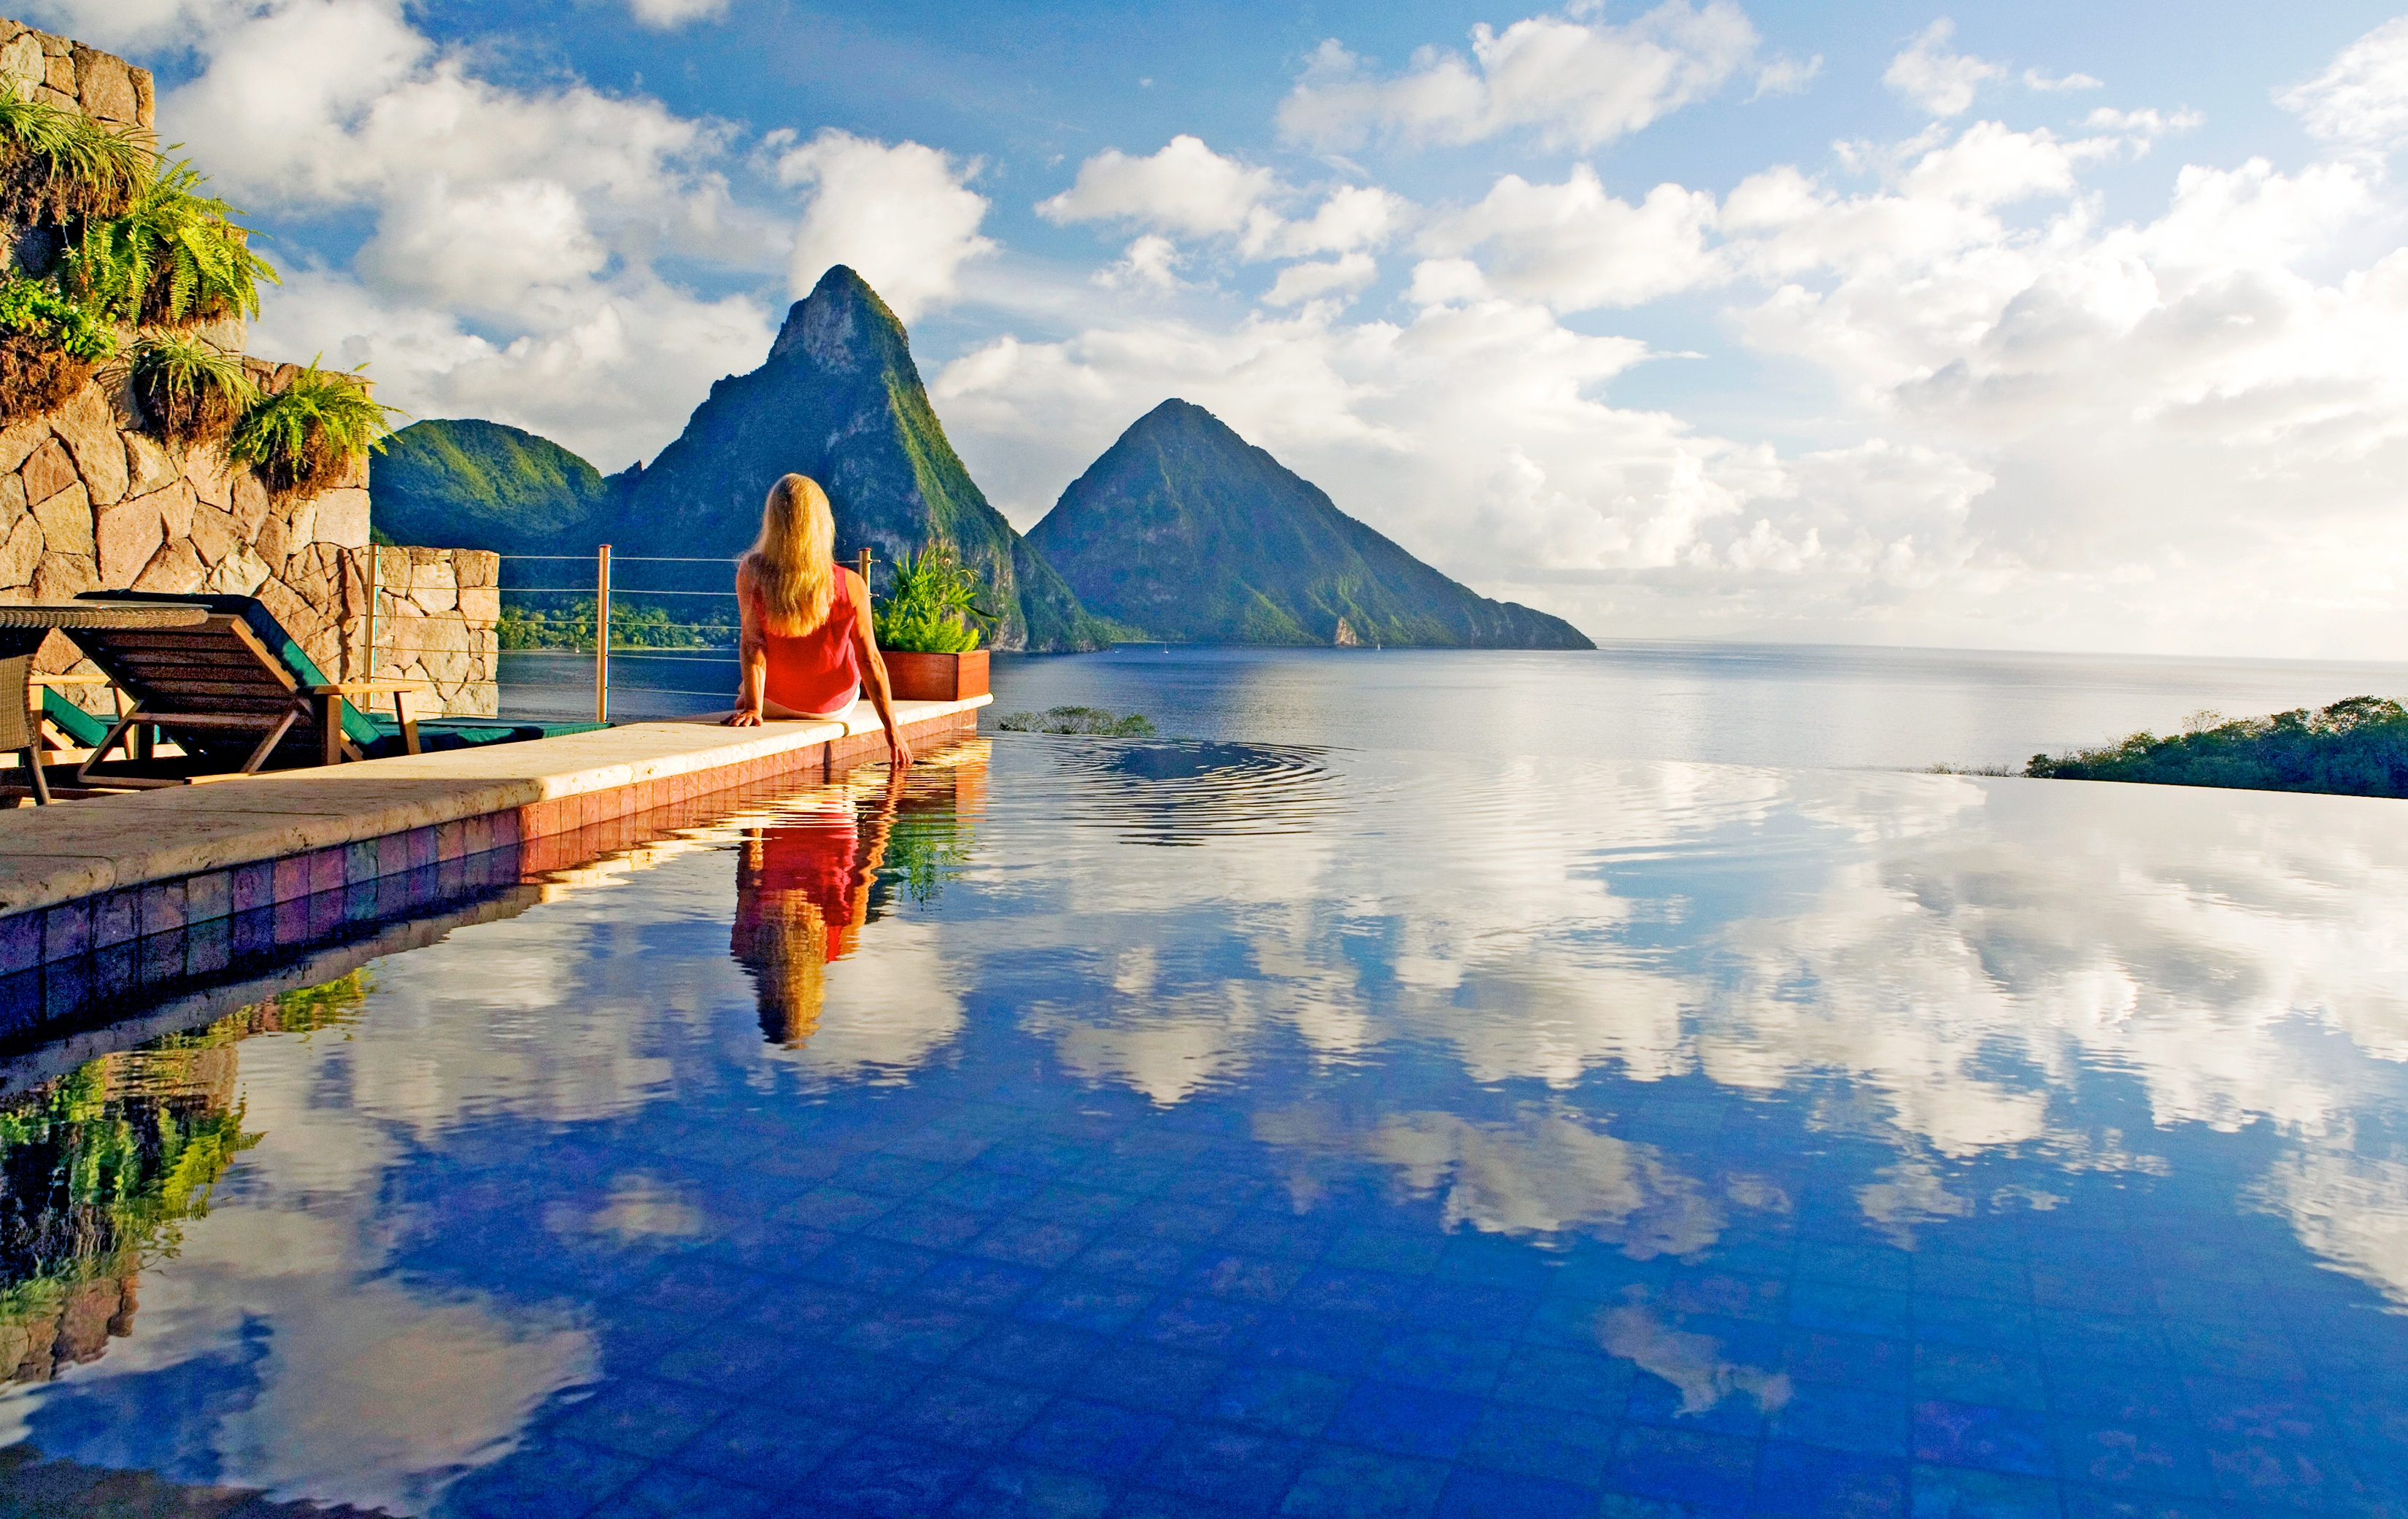 piscina_hotel_jade_mountain_santa_lucia_caribe_6.jpg